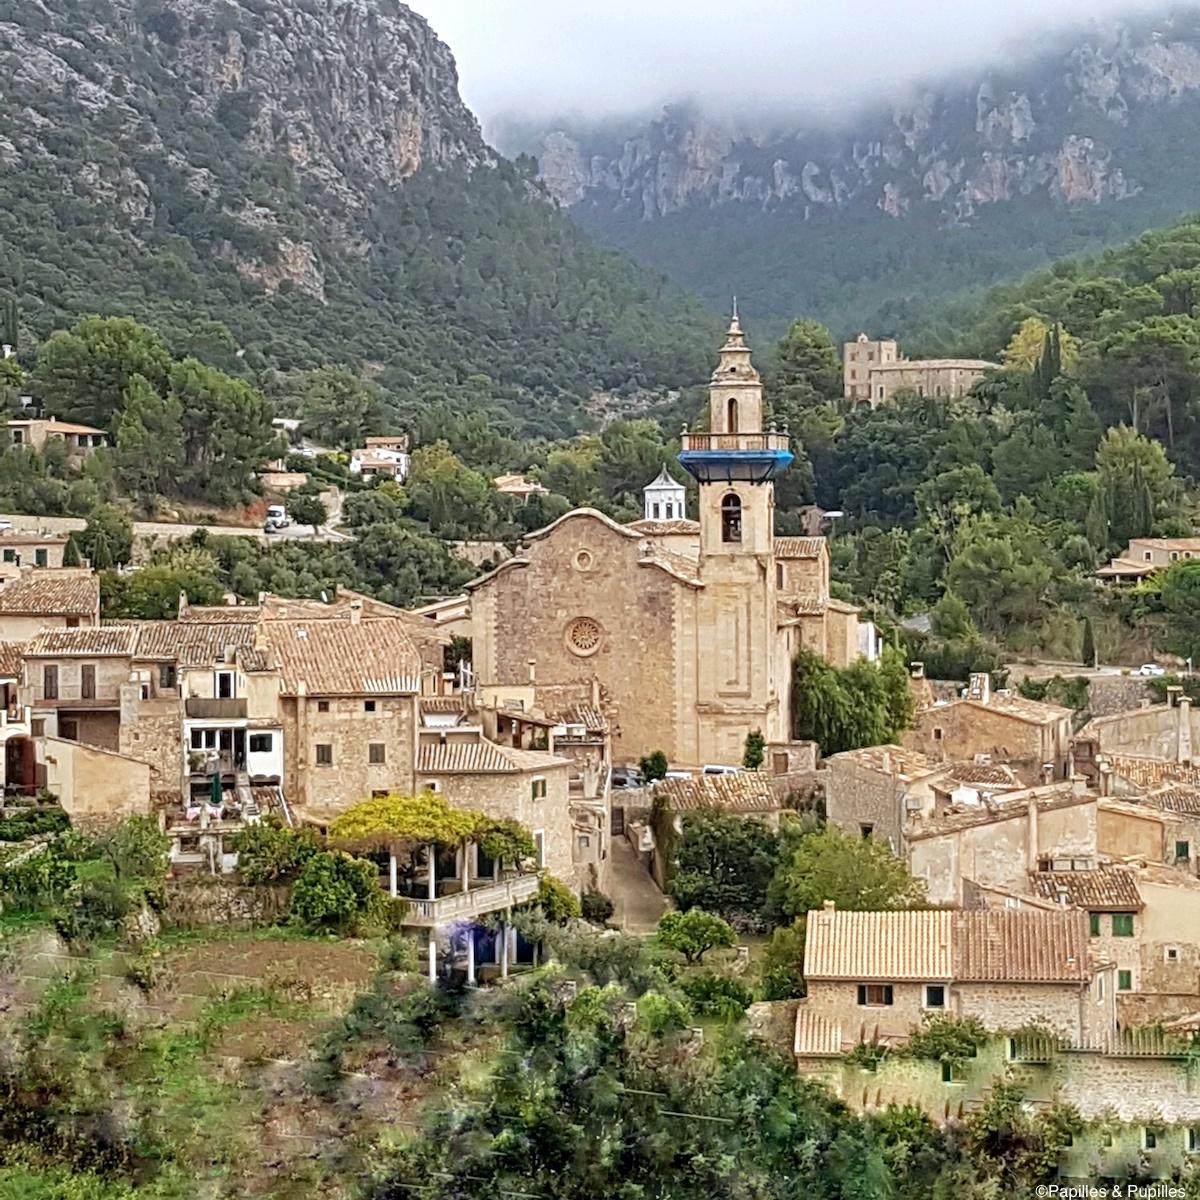 Valldemossa - Nichée dans la montagne